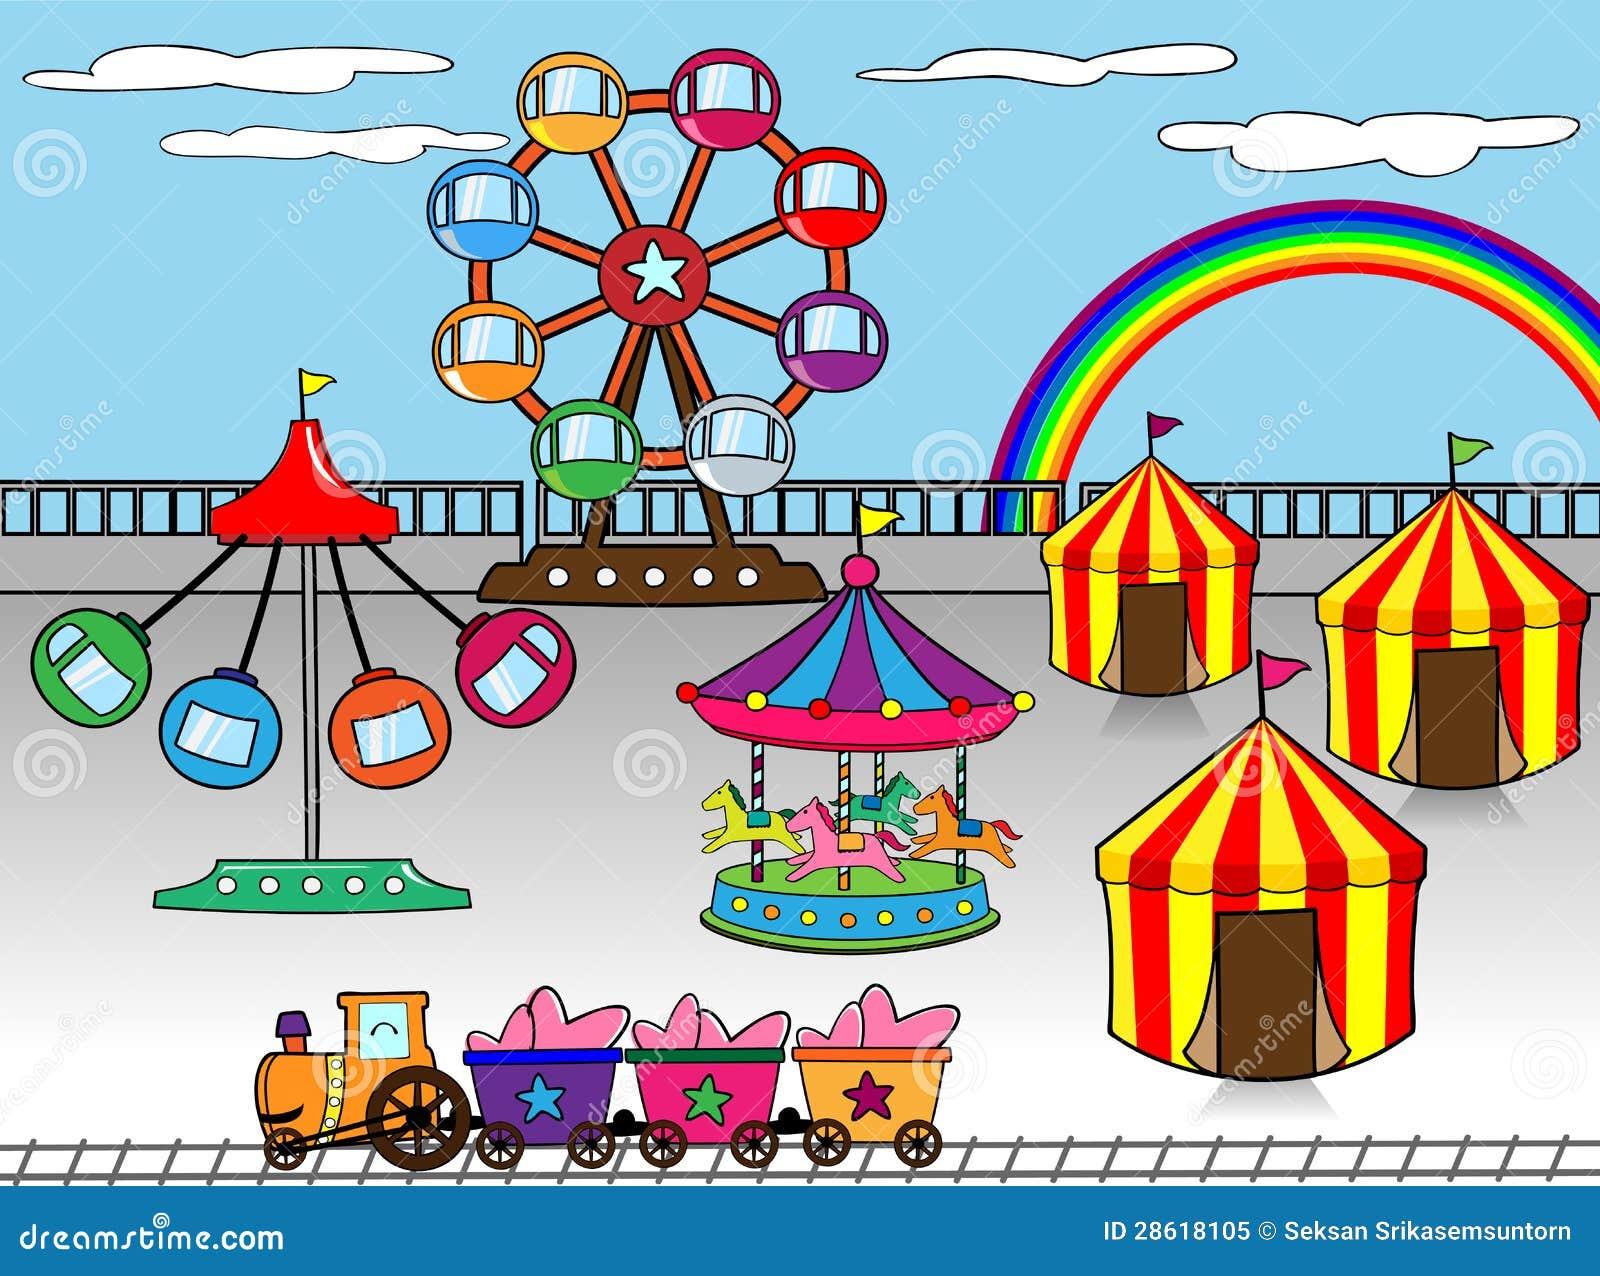 Amusement Park Royalty Free Stock Photo - Image: 28618105